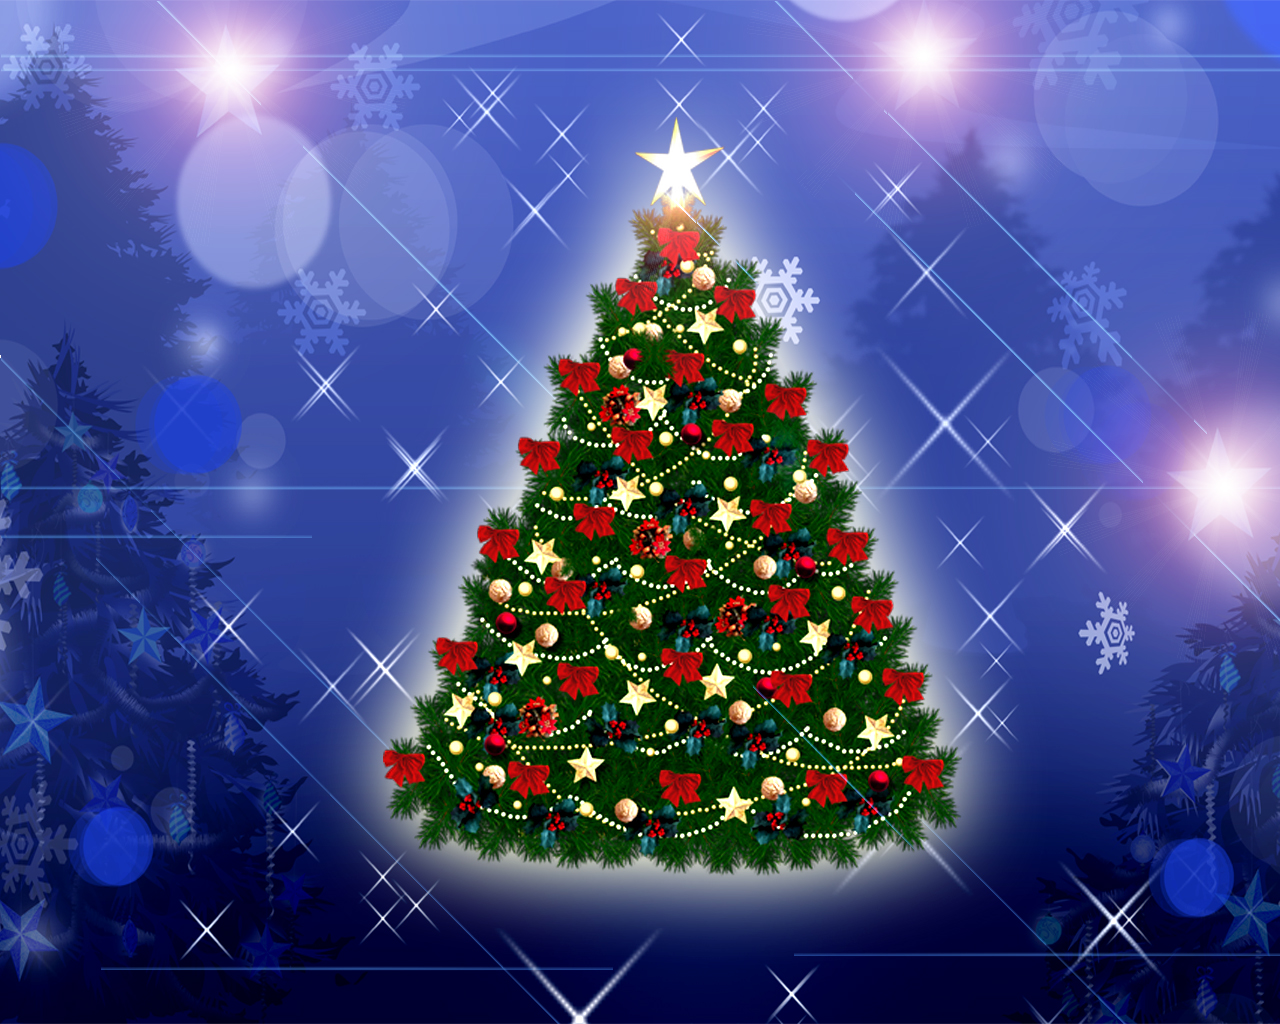 1280x1024 Christmas Tree desktop PC and Mac wallpaper 1280x1024